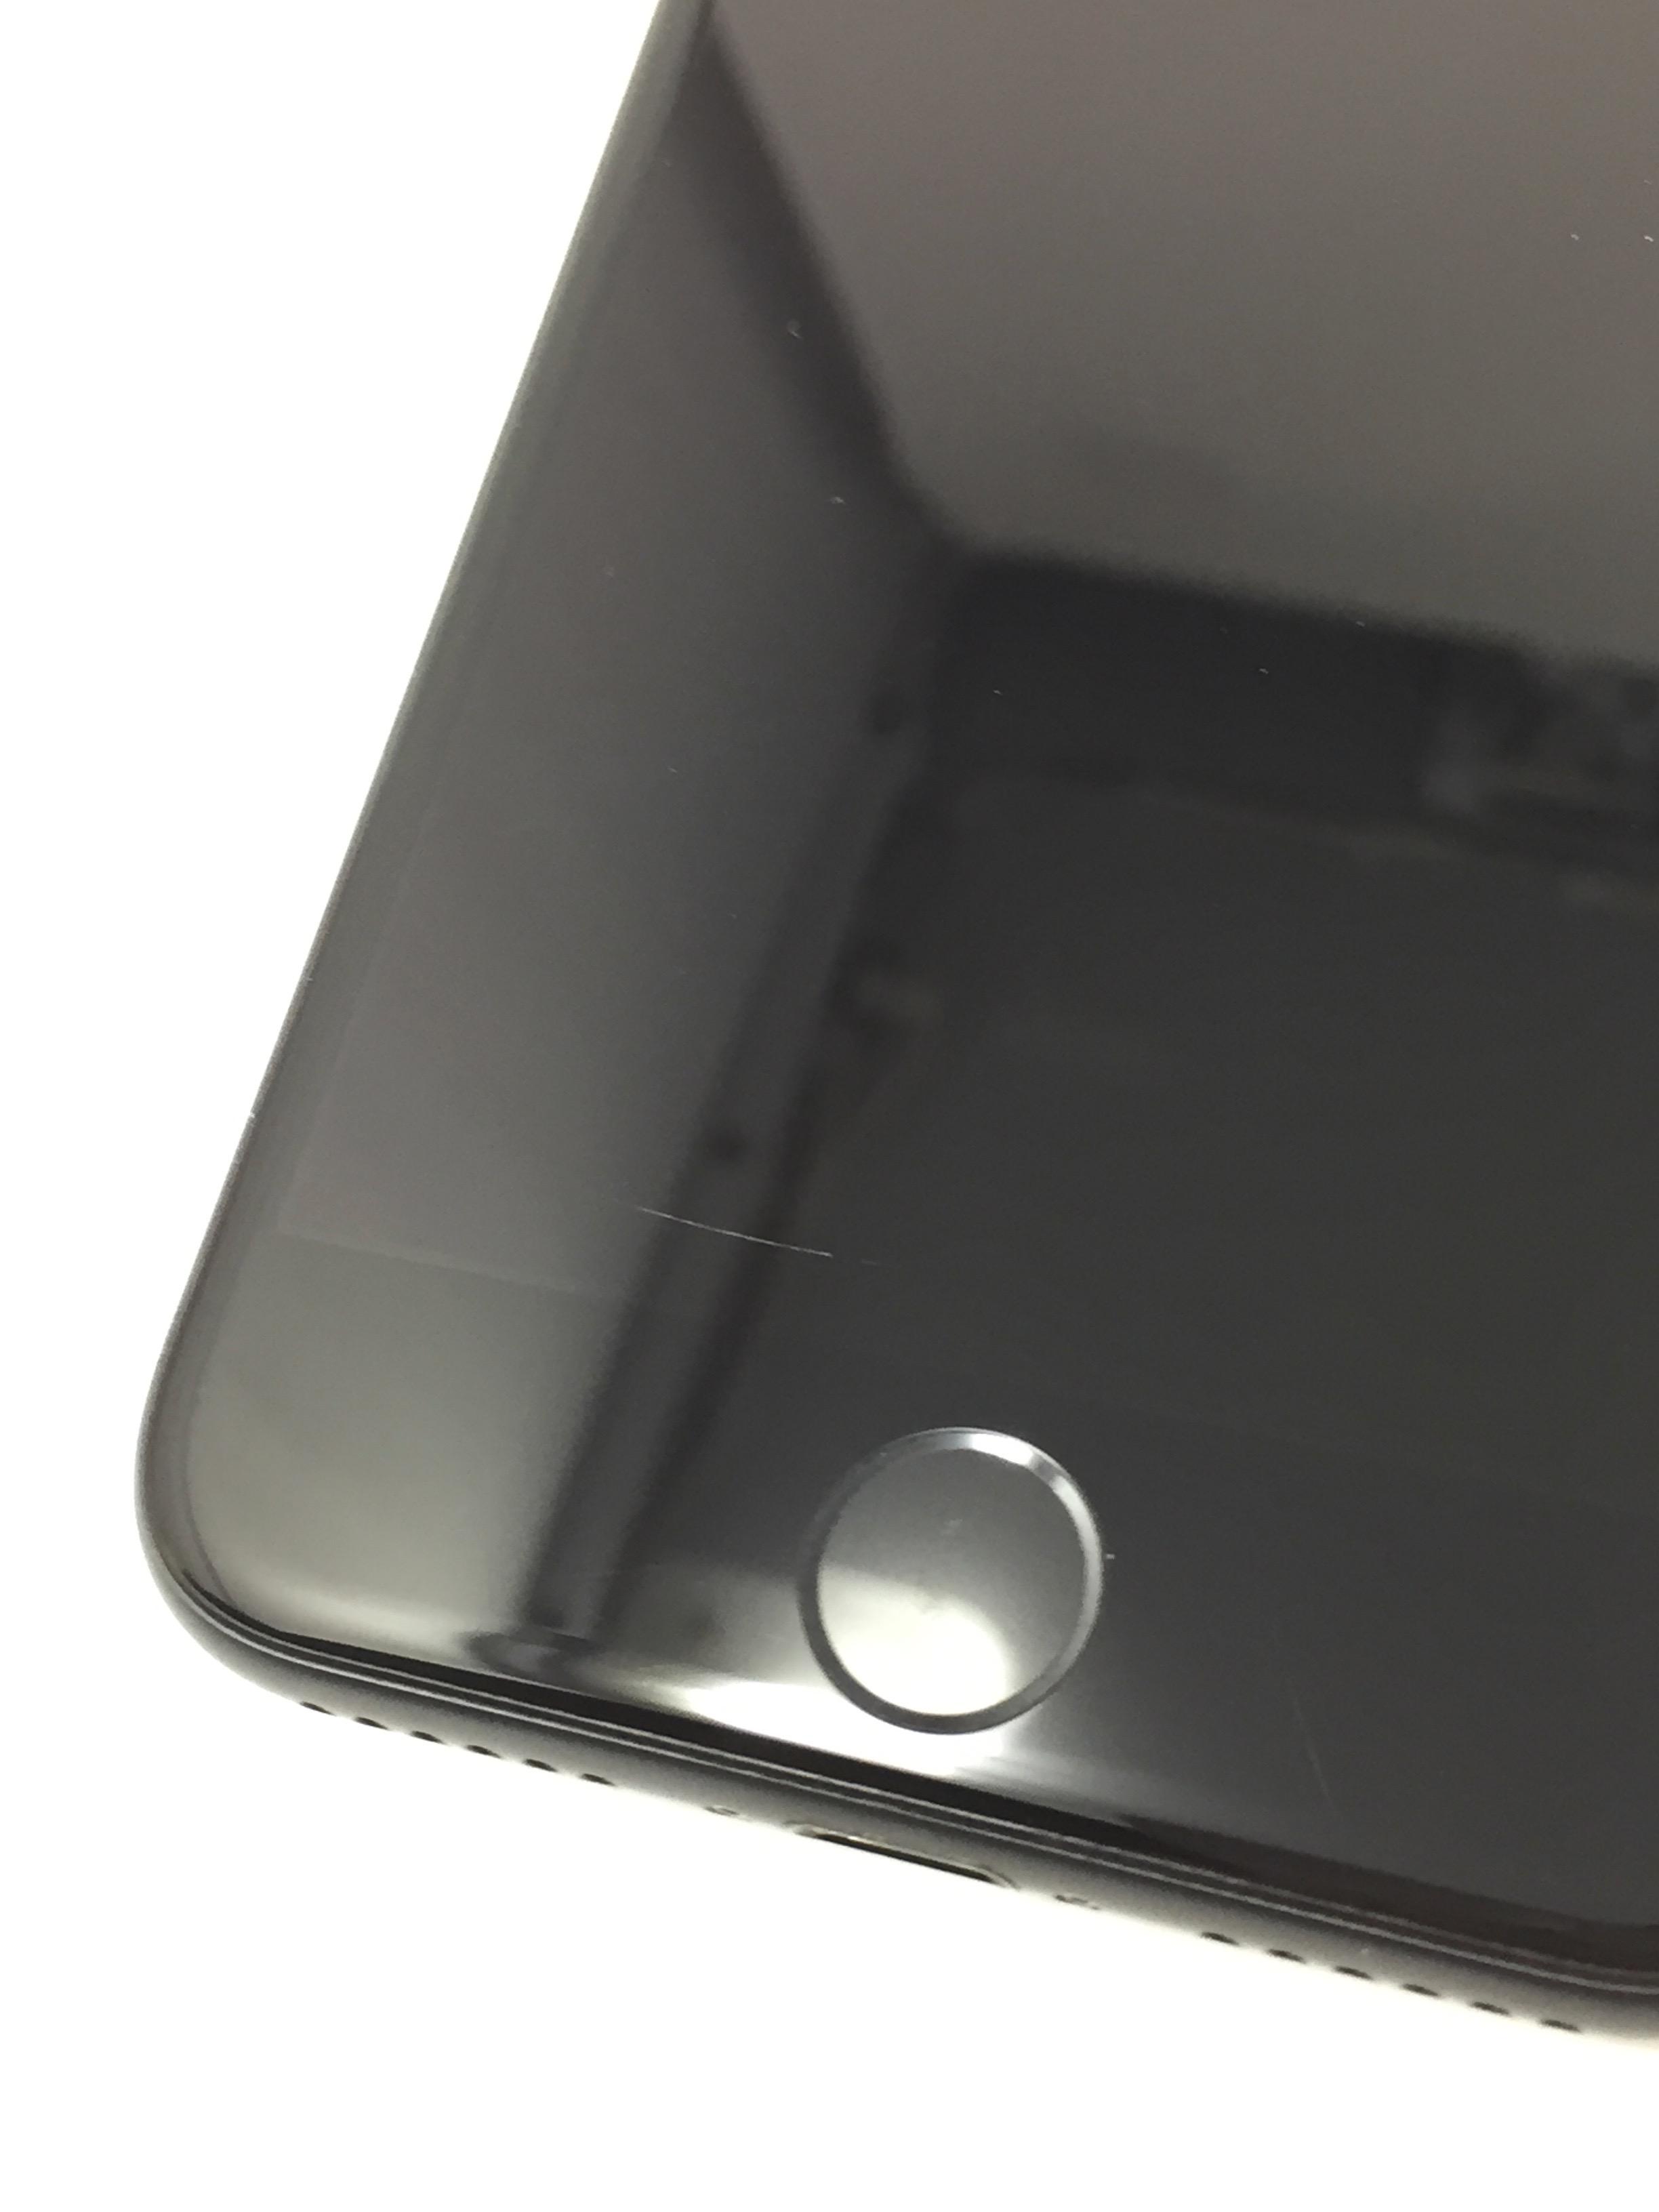 iPhone 7 32GB, 32 GB, Black, Kuva 3